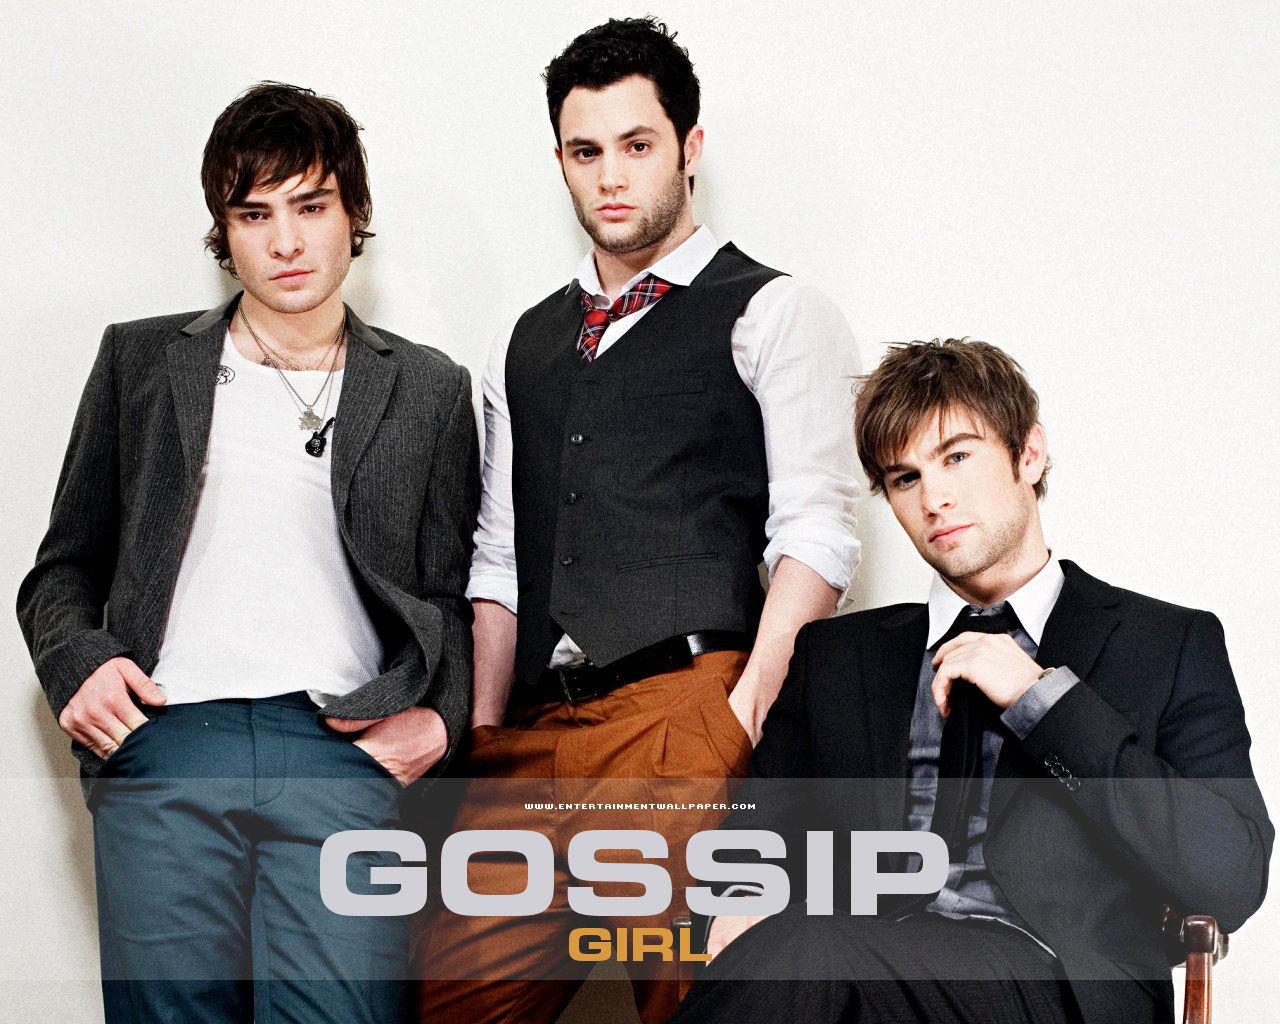 gossip girl wallpapers gossip girl wallpaper 12054841